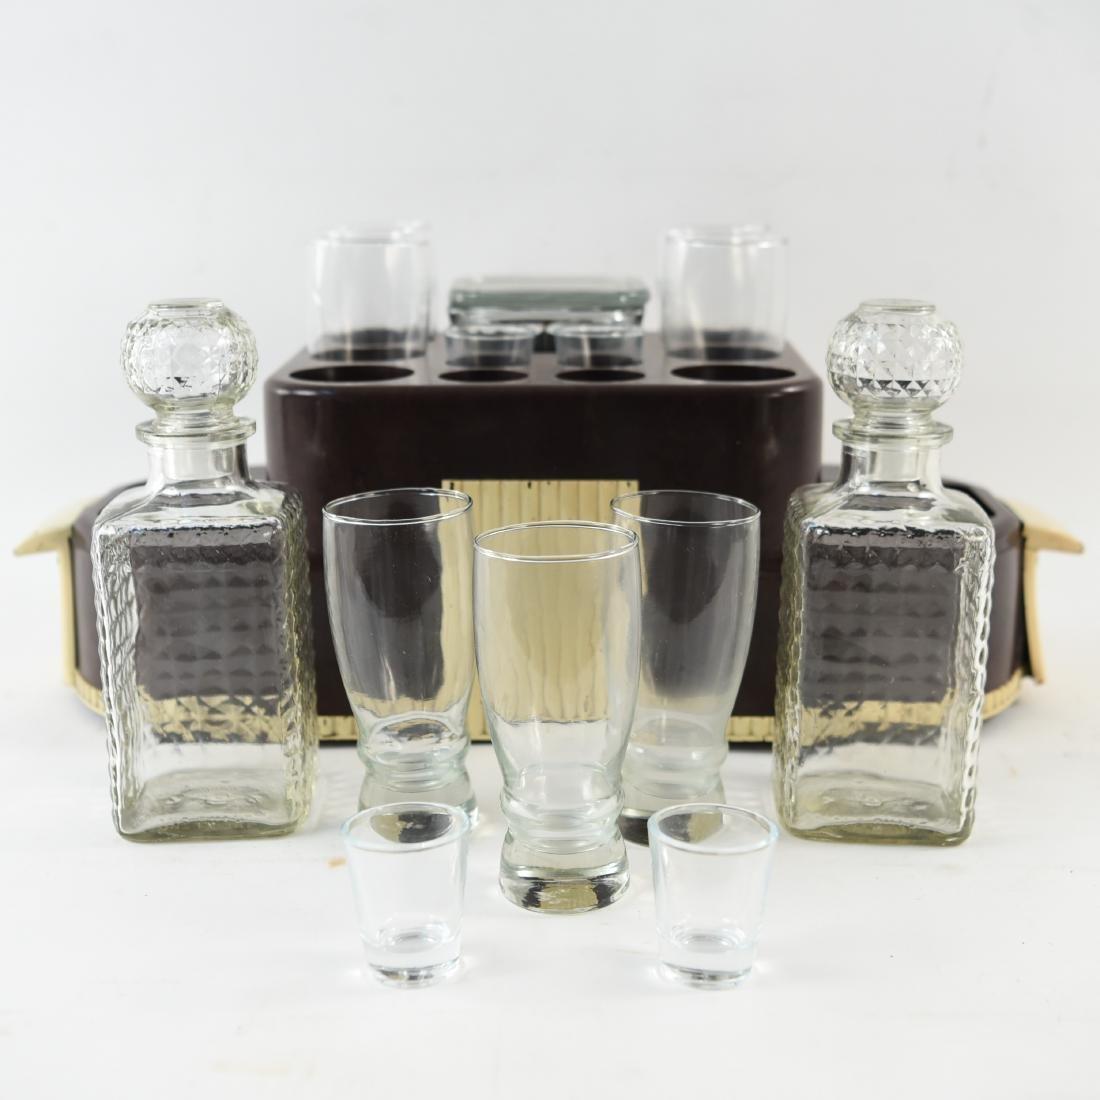 VINTAGE ART DECO LIQUOR DRINK CADDY - 9